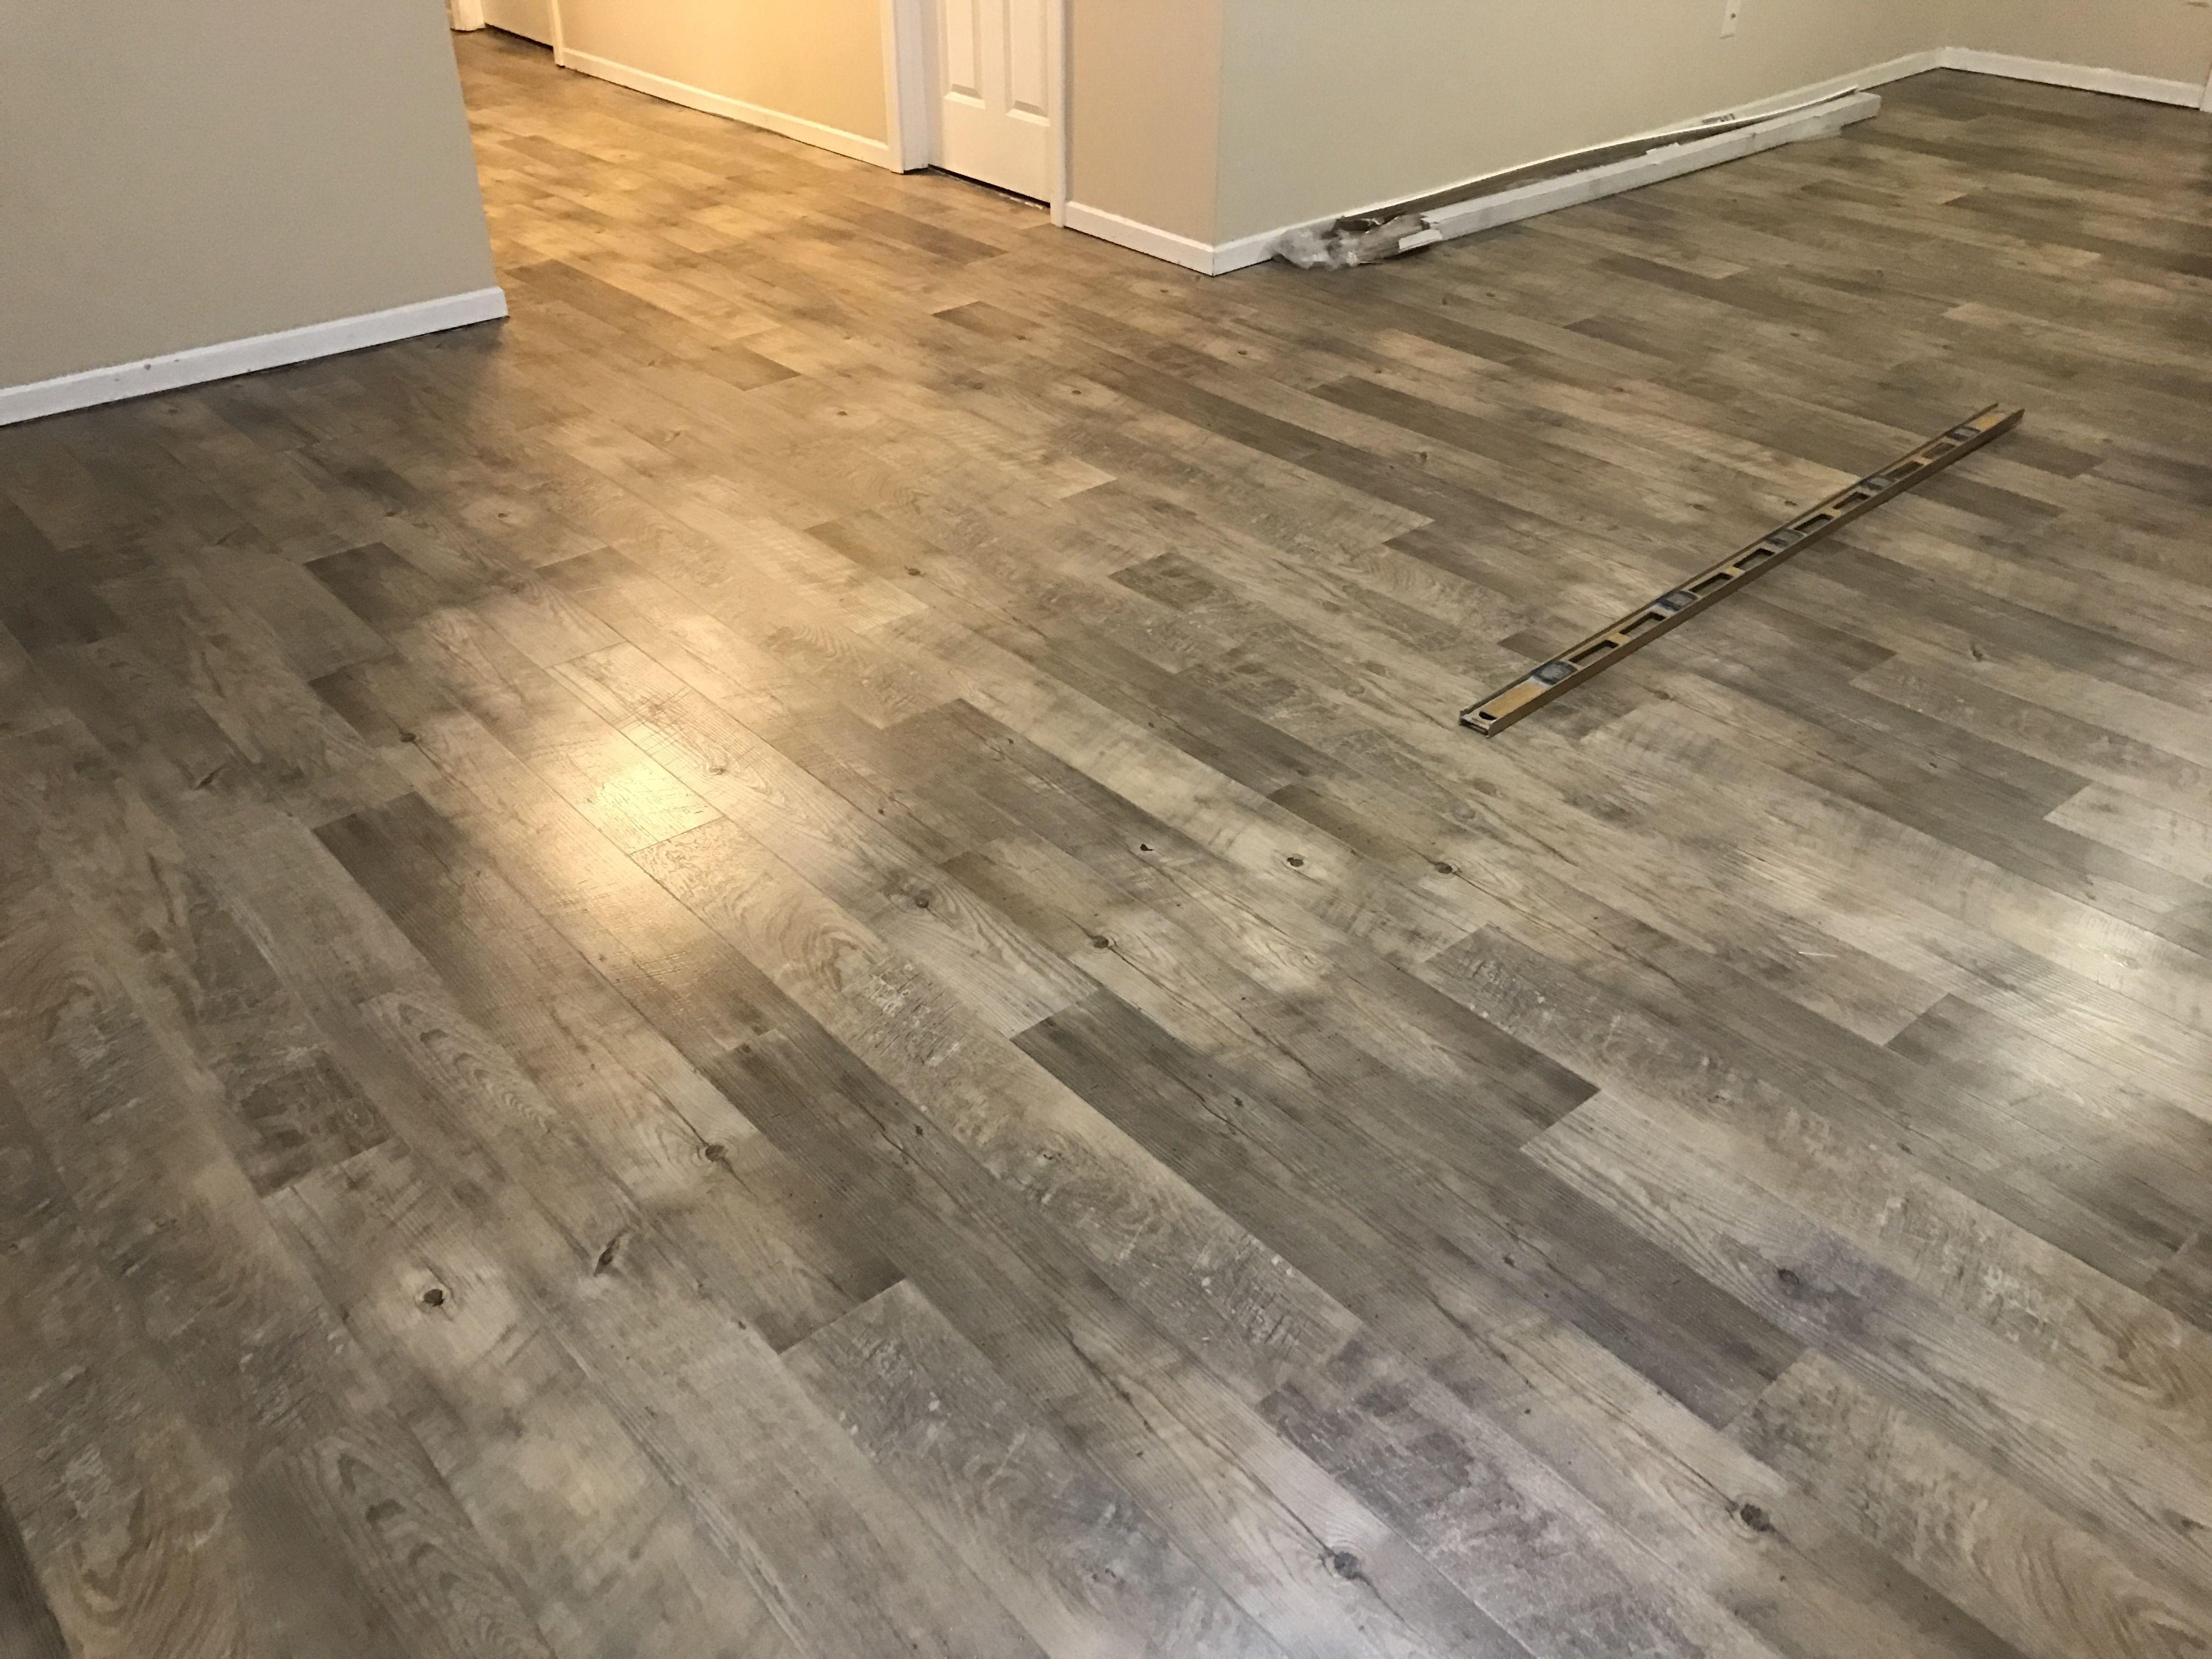 hardwood flooring adhesive glue of weathered pine vinyl floors pinterest luxury vinyl plank in dockside sand mannington adura luxury vinyl plank glue down in basement